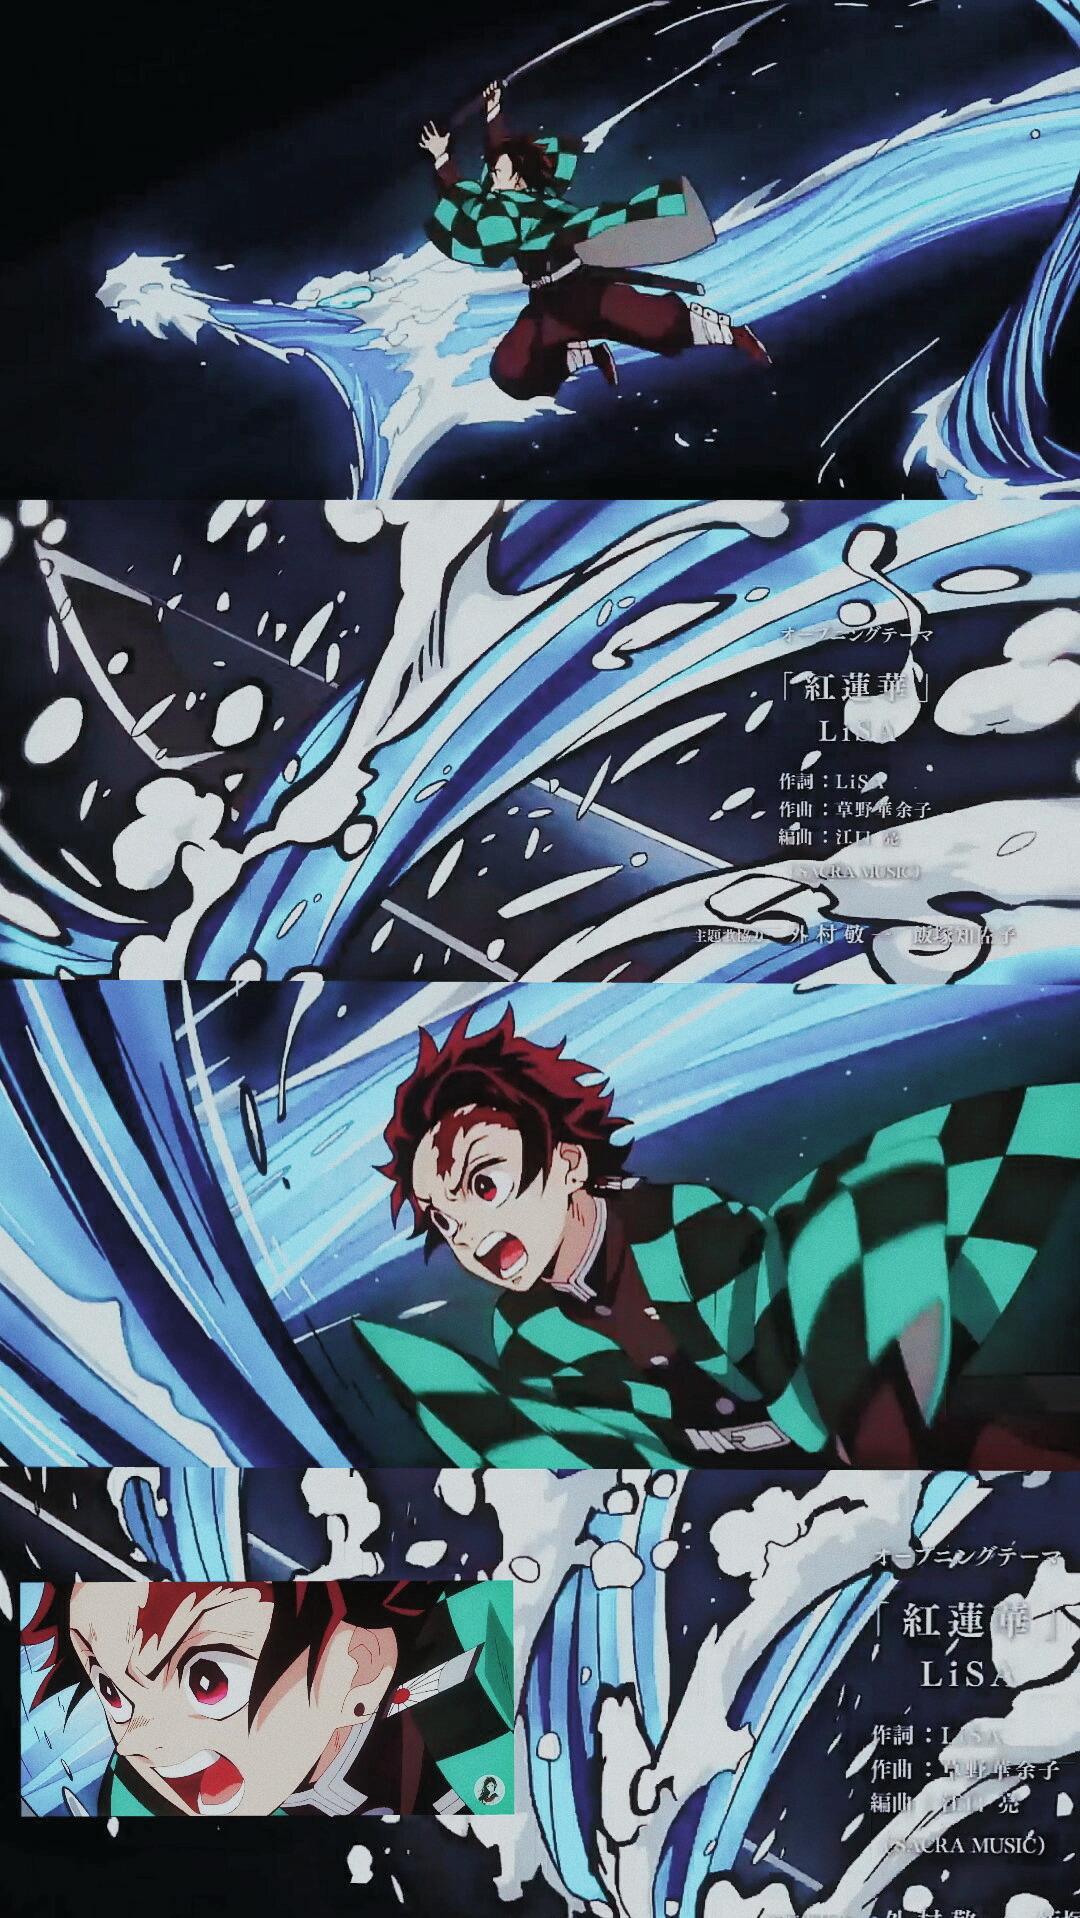 anime aesthetic slayer computer wallpapers